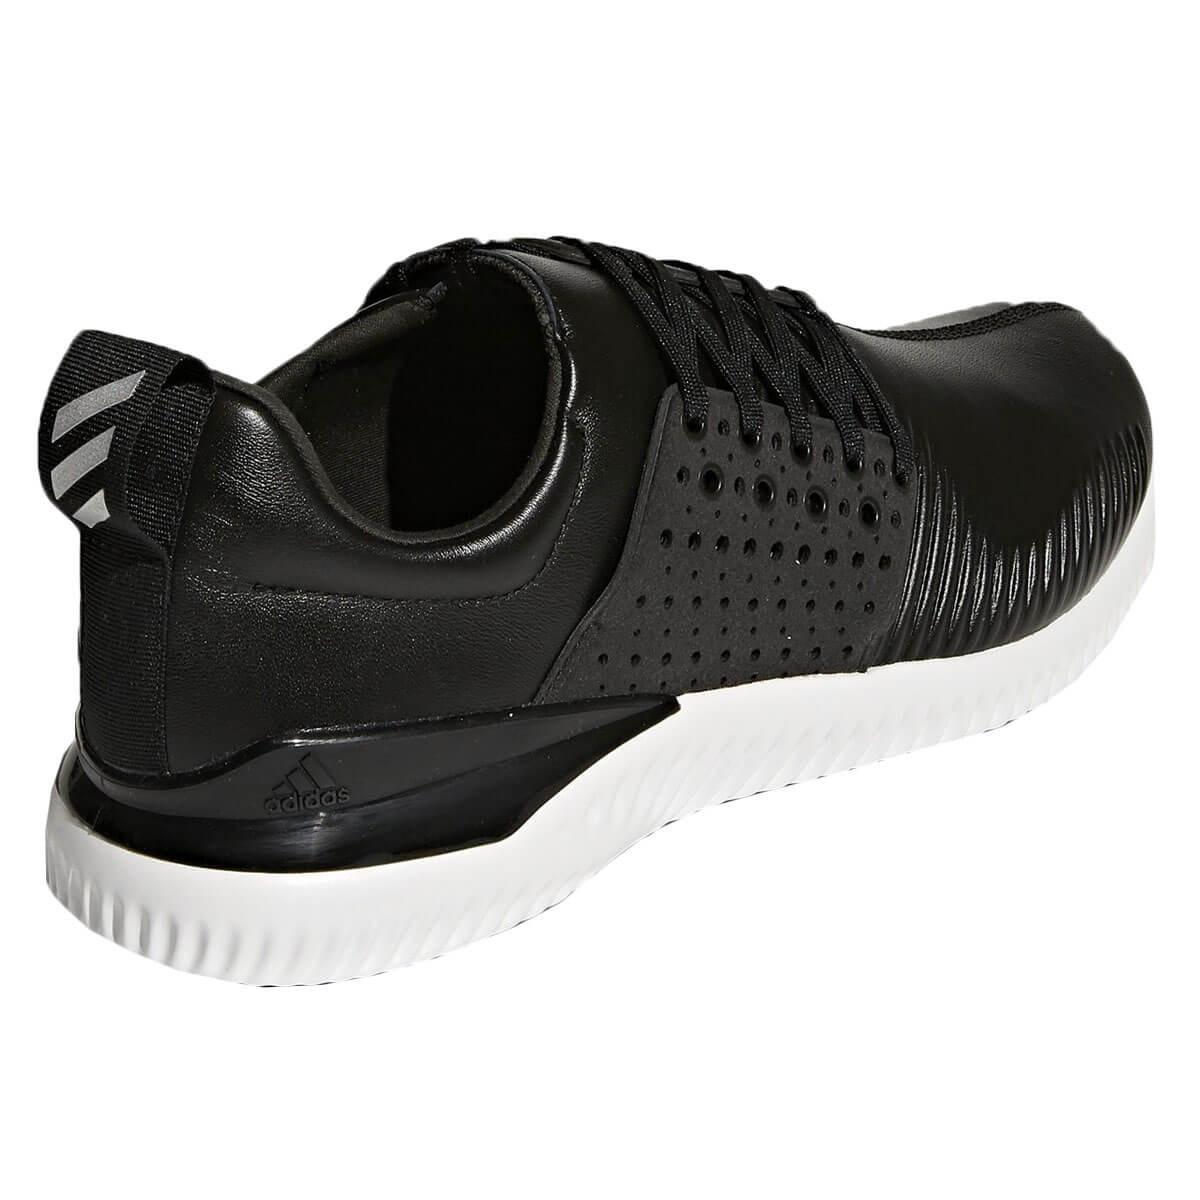 62c40214c ... adidas Golf Mens 2019 Adicross Bounce Spikeless Golf Shoes.   Back. prev